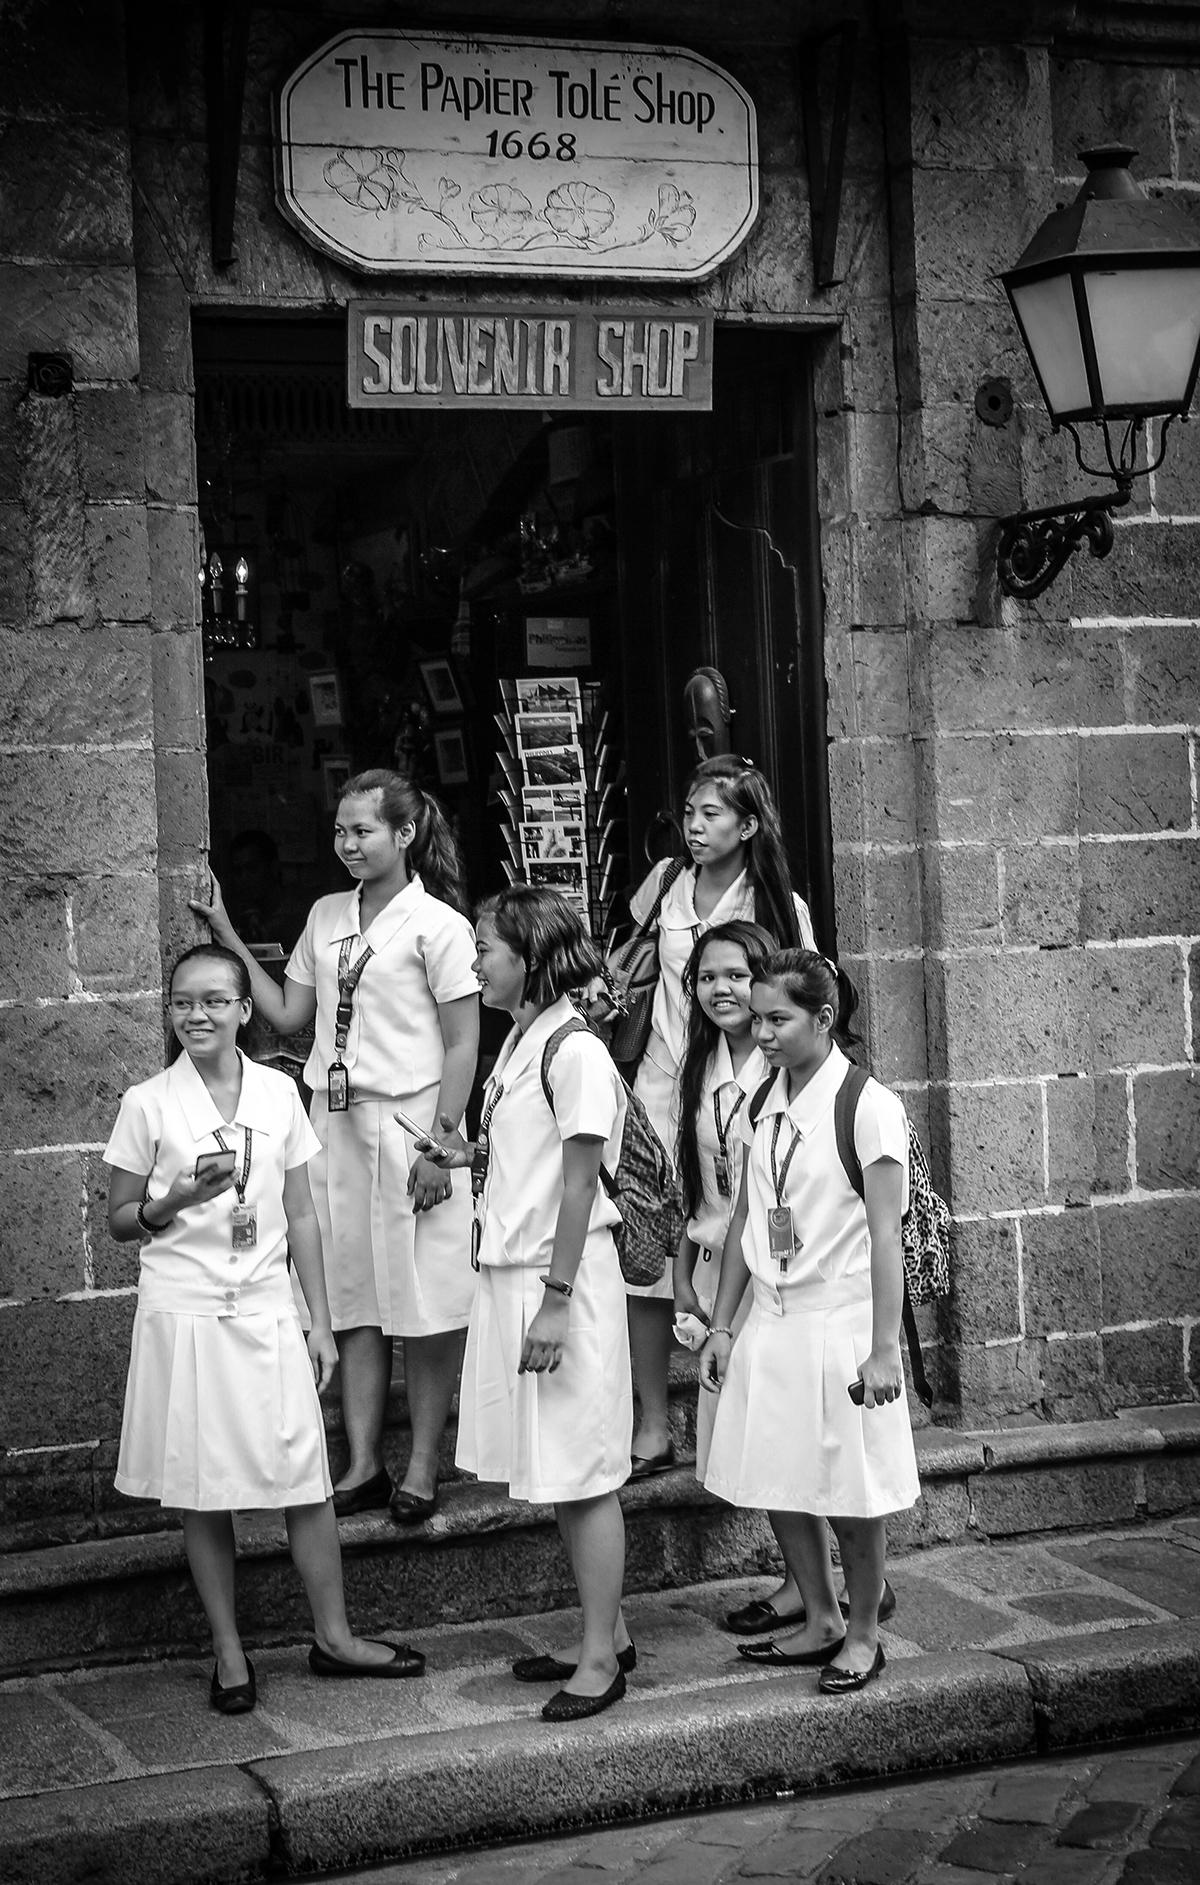 philippines portrait el nido palawan Boracay Manila Filipinos filipino black and white b&w